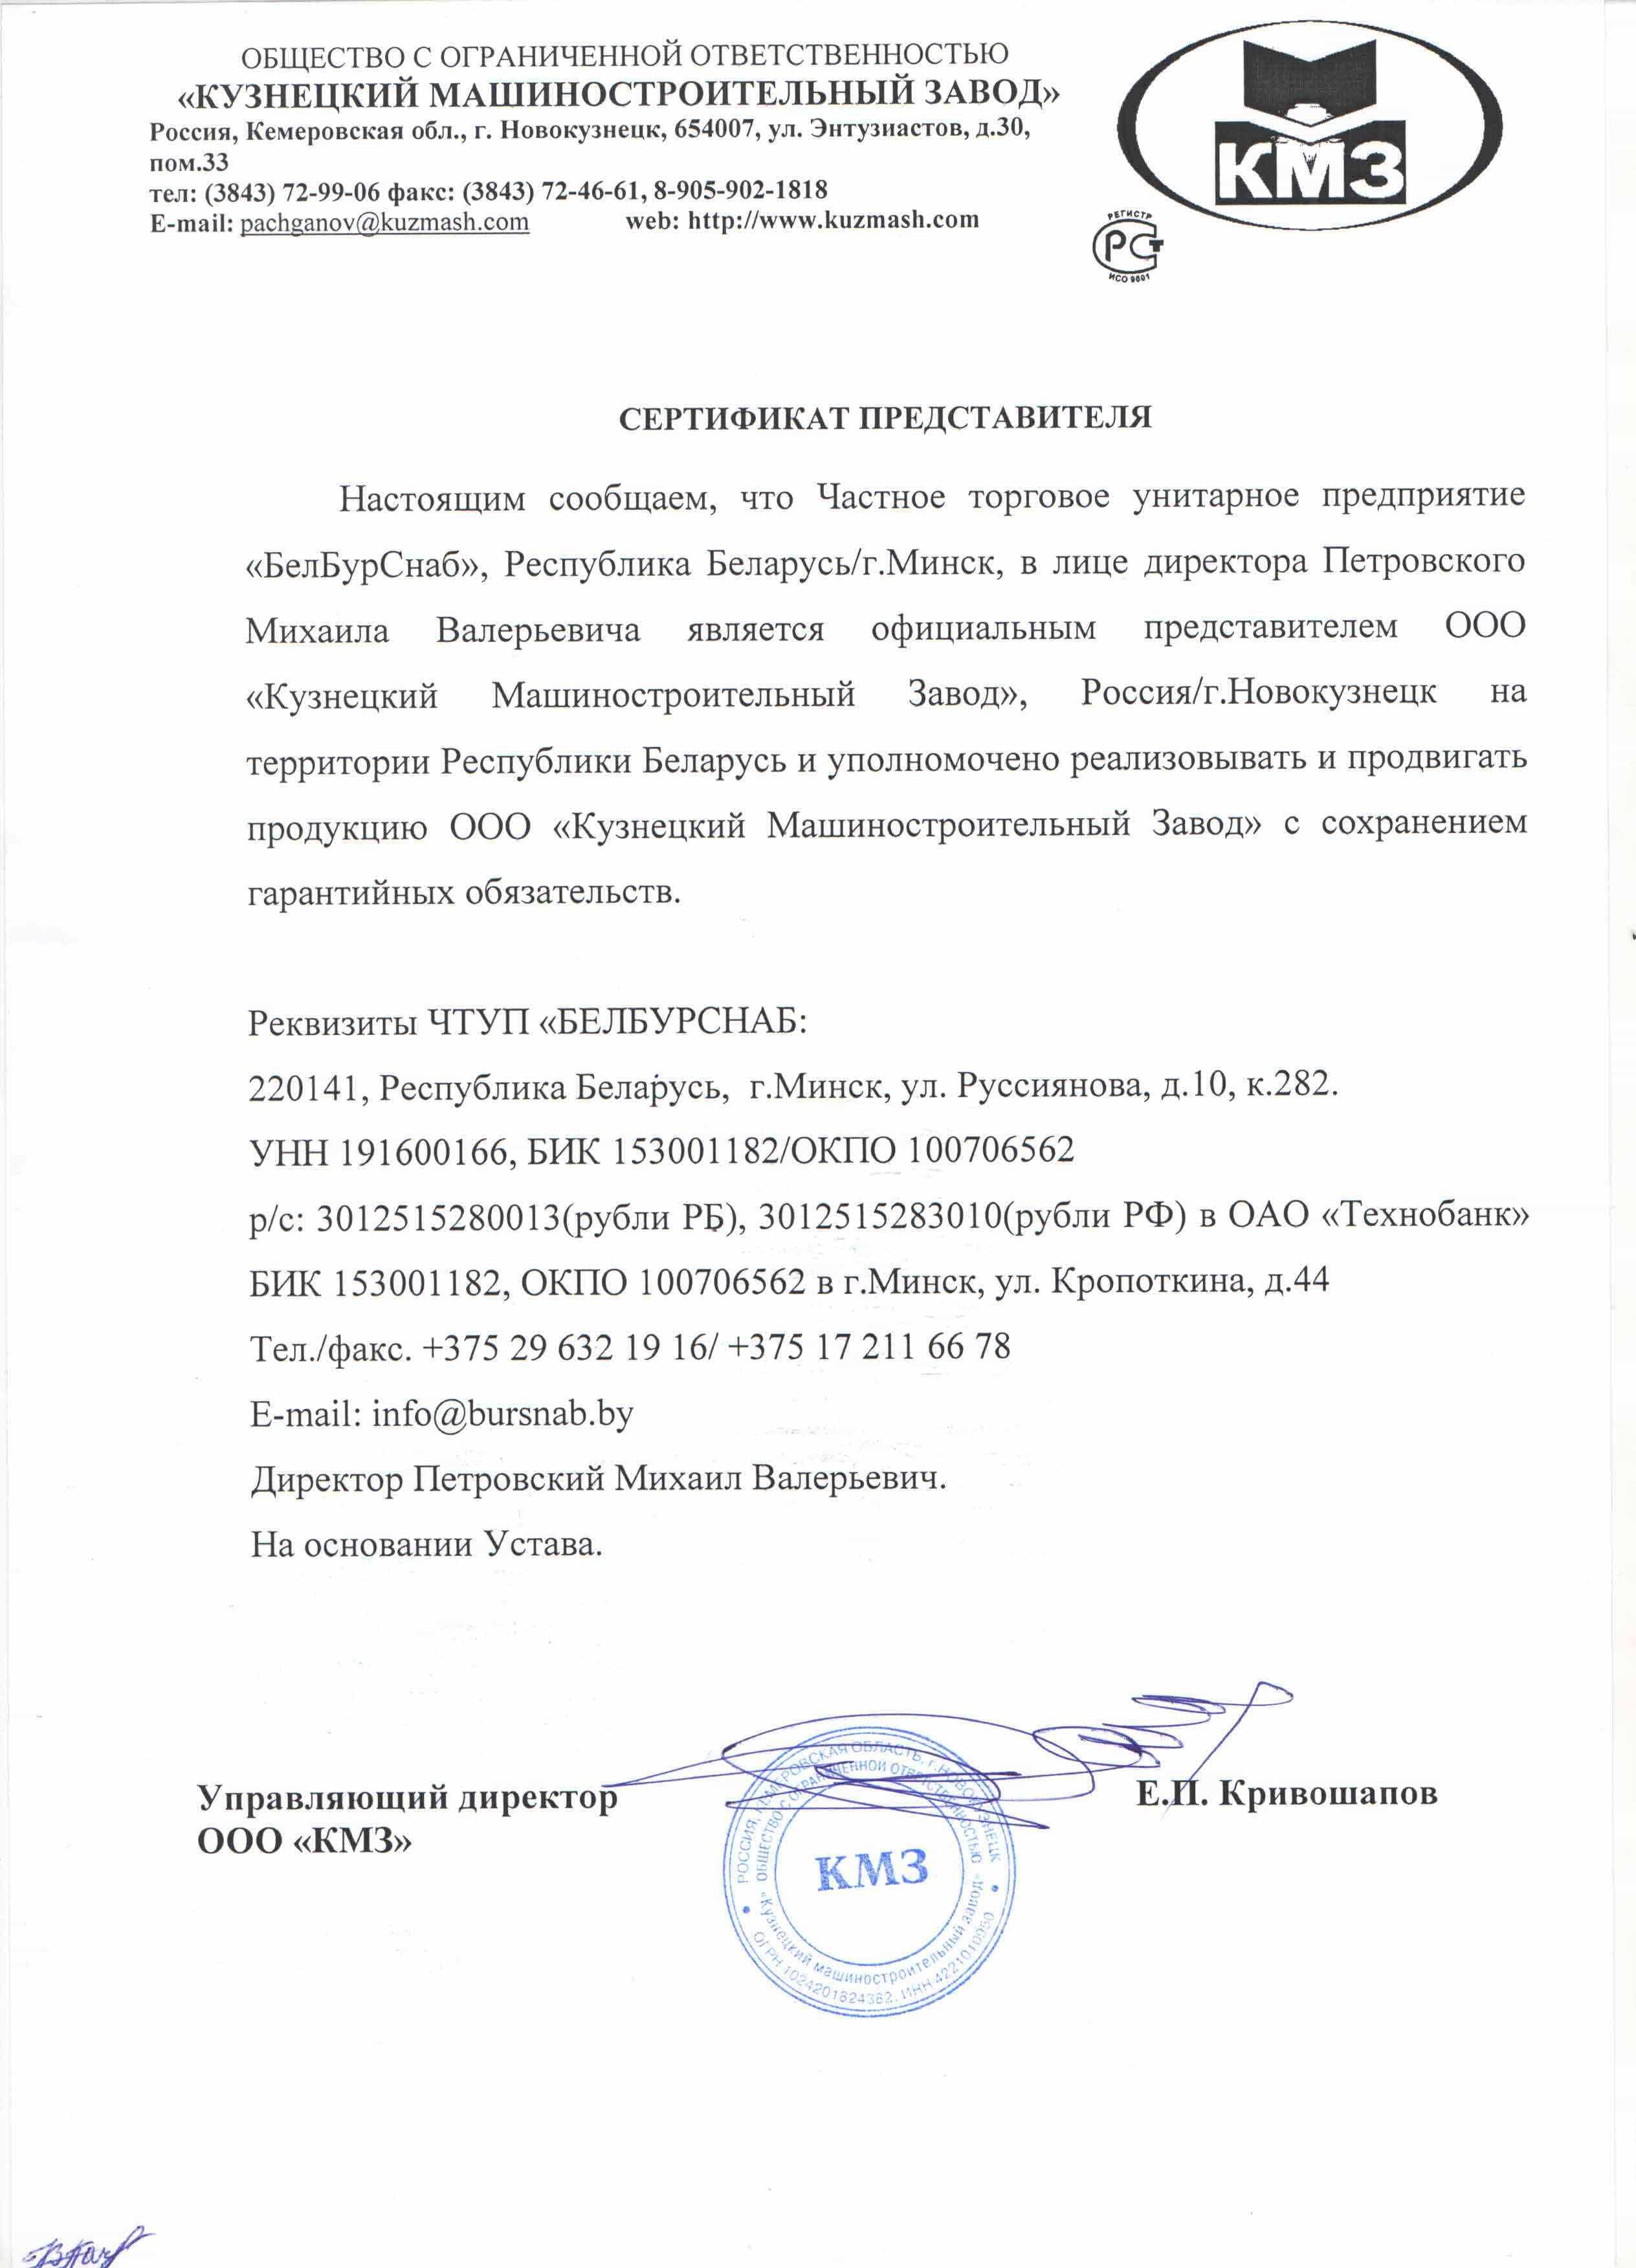 Сертификат представителя ООО КМЗ